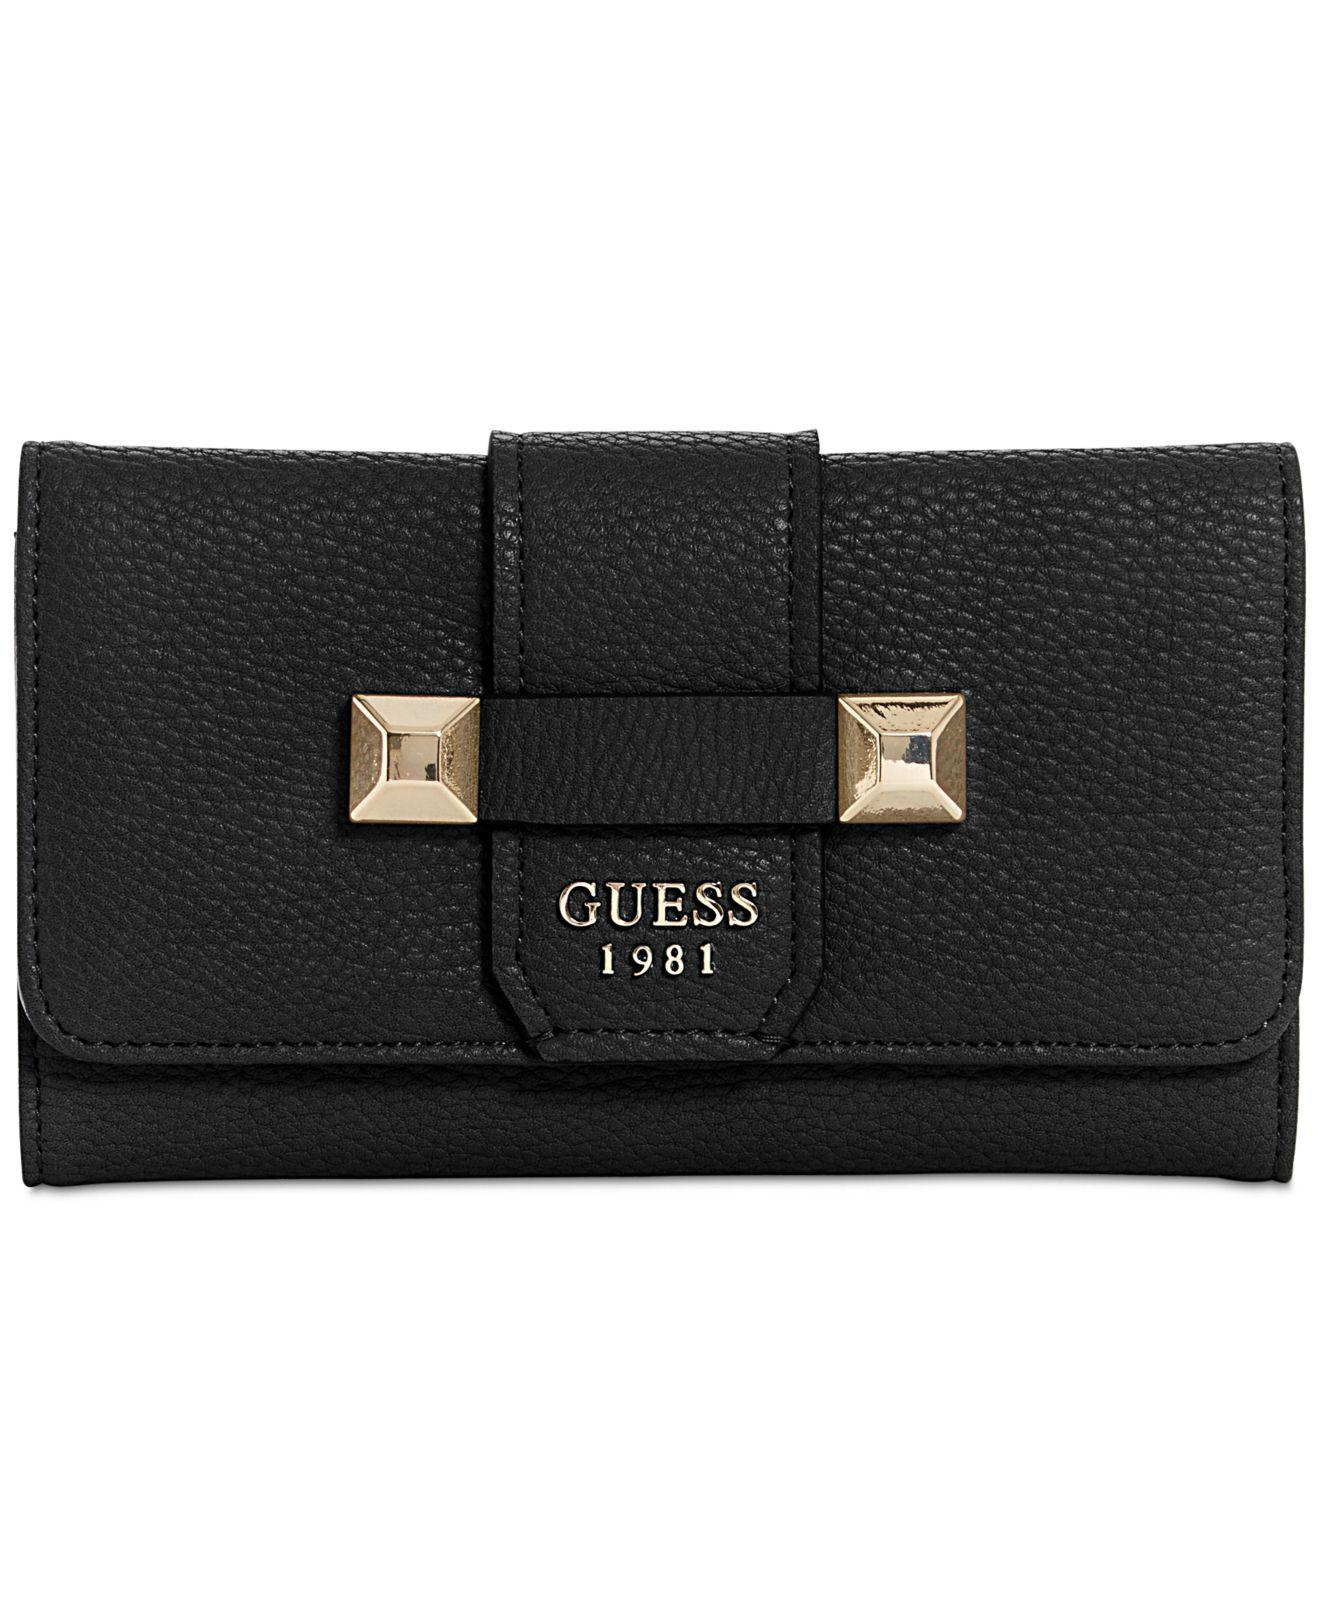 Lyst - Guess Talan Slim Clutch Wallet in Black 1f6dcf1dc17